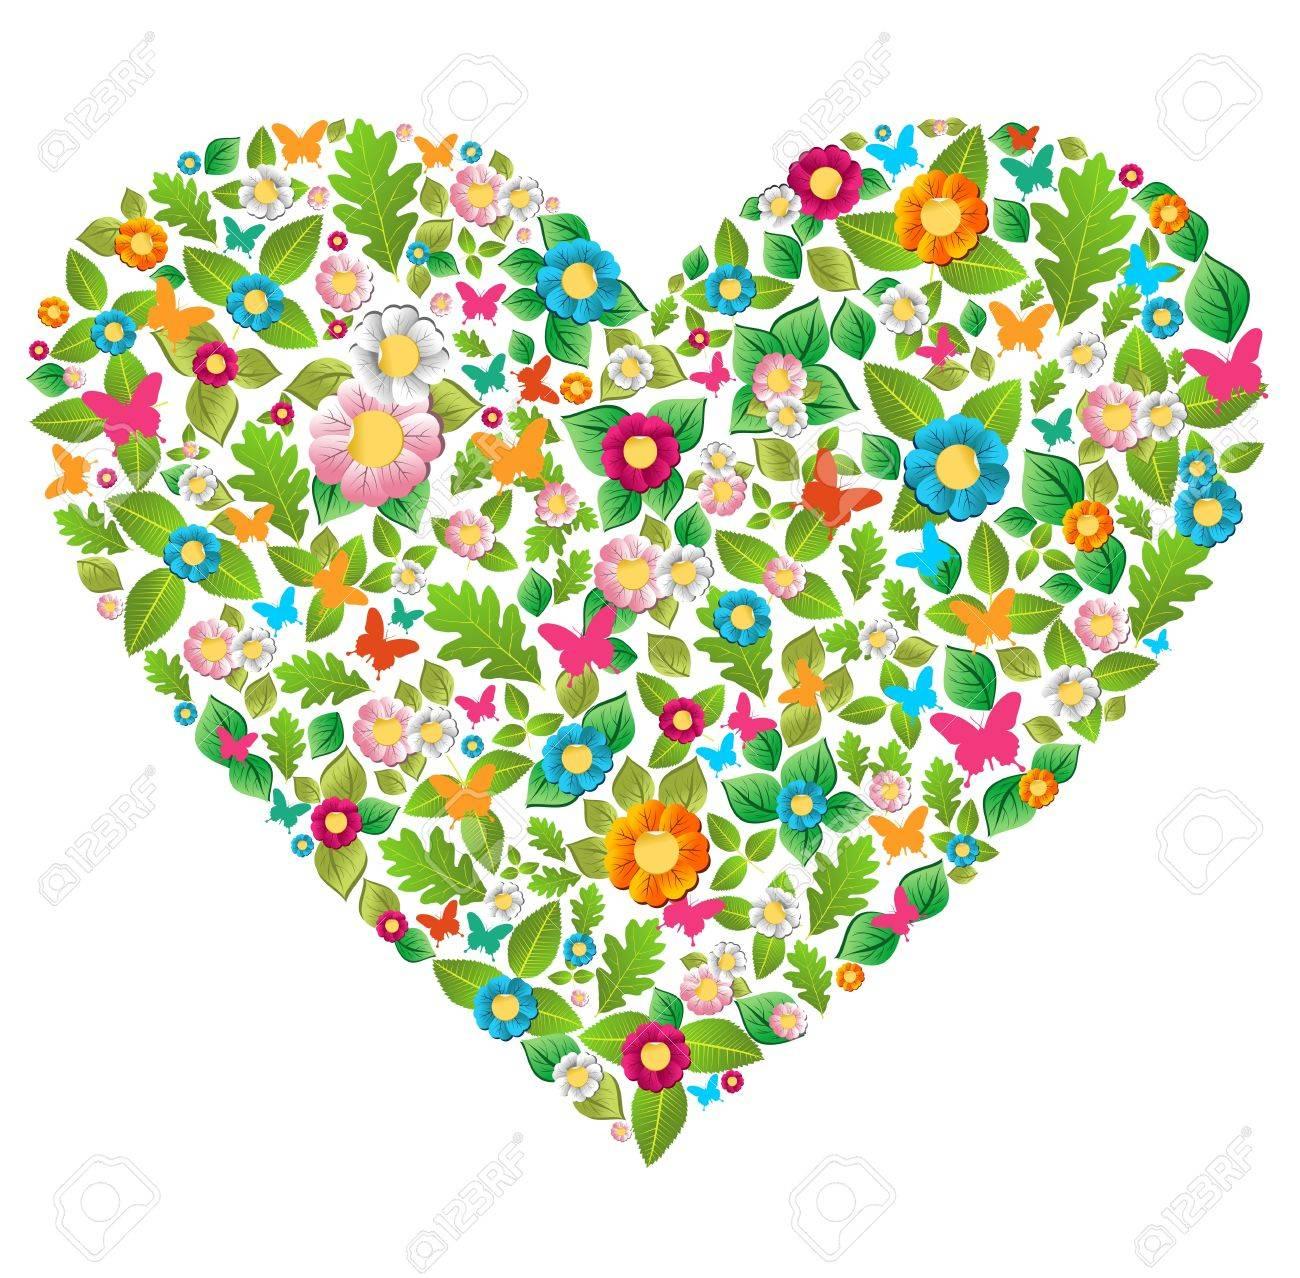 Leaf Flower And Butterfly In Love Heart Shape